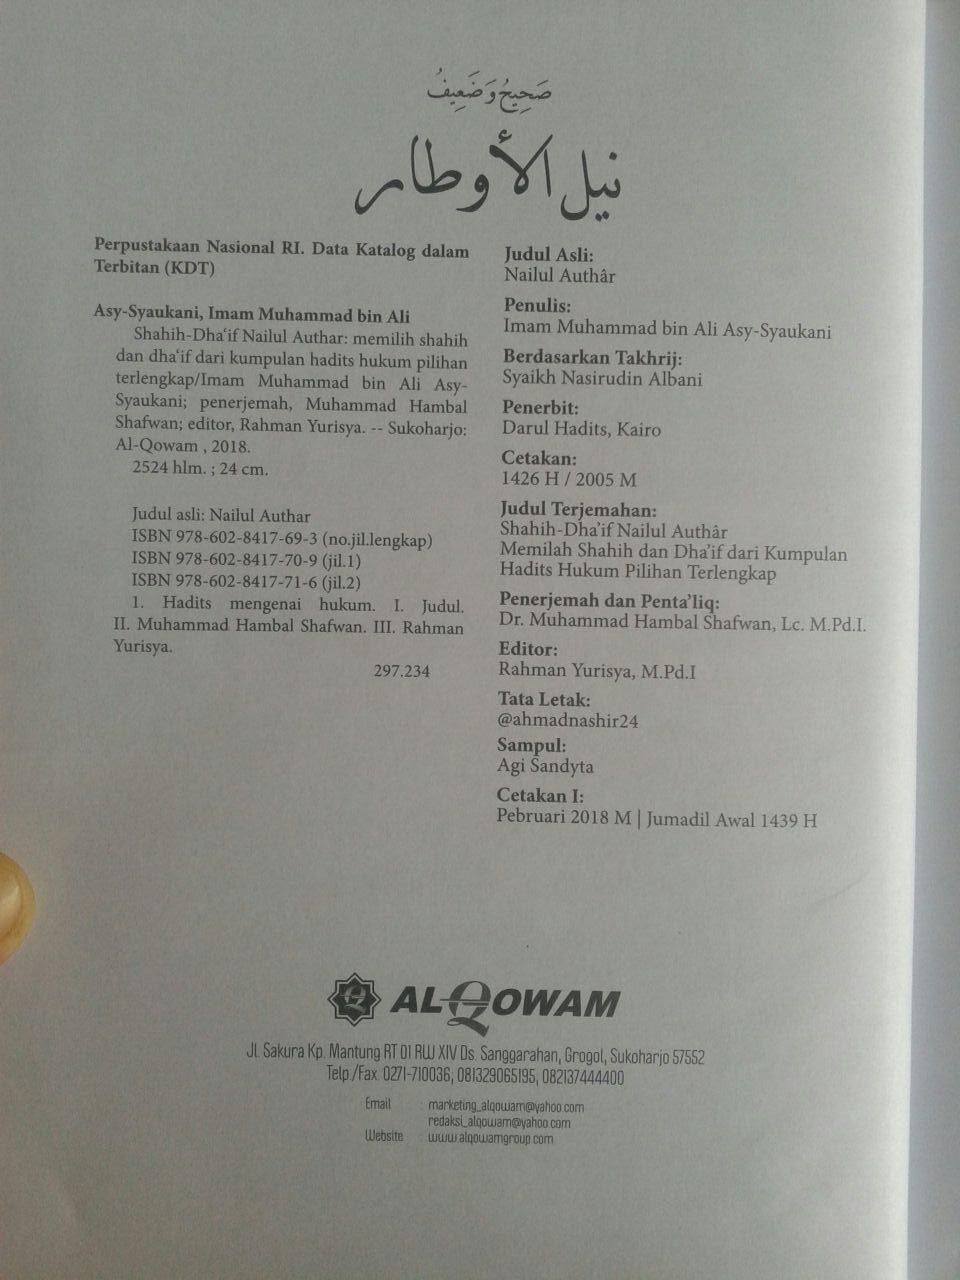 Buku Shahih Dhaif Nailul Authar Kumpulan Hadits Hukum Terlengkap isi 3